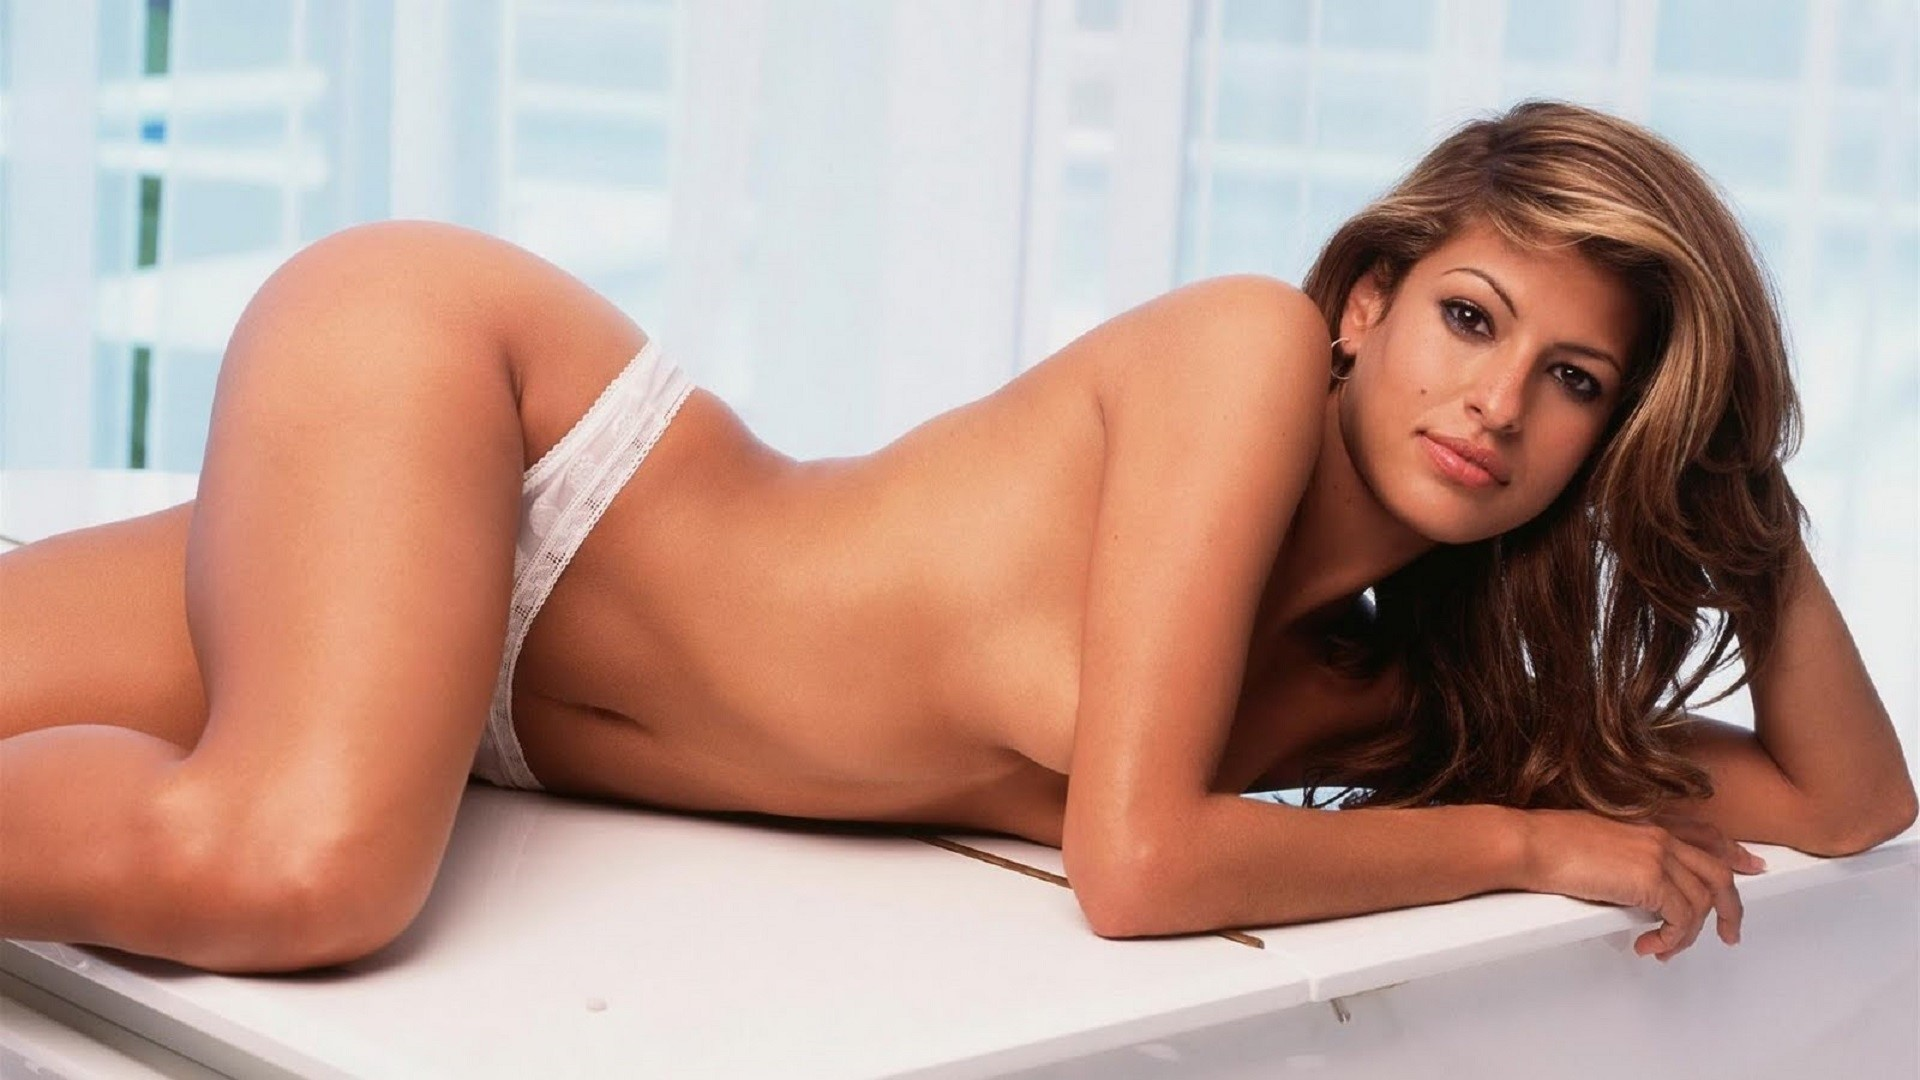 Eva Mendes Wallpapers Nude  Eva Mendes Wallpapers Nude